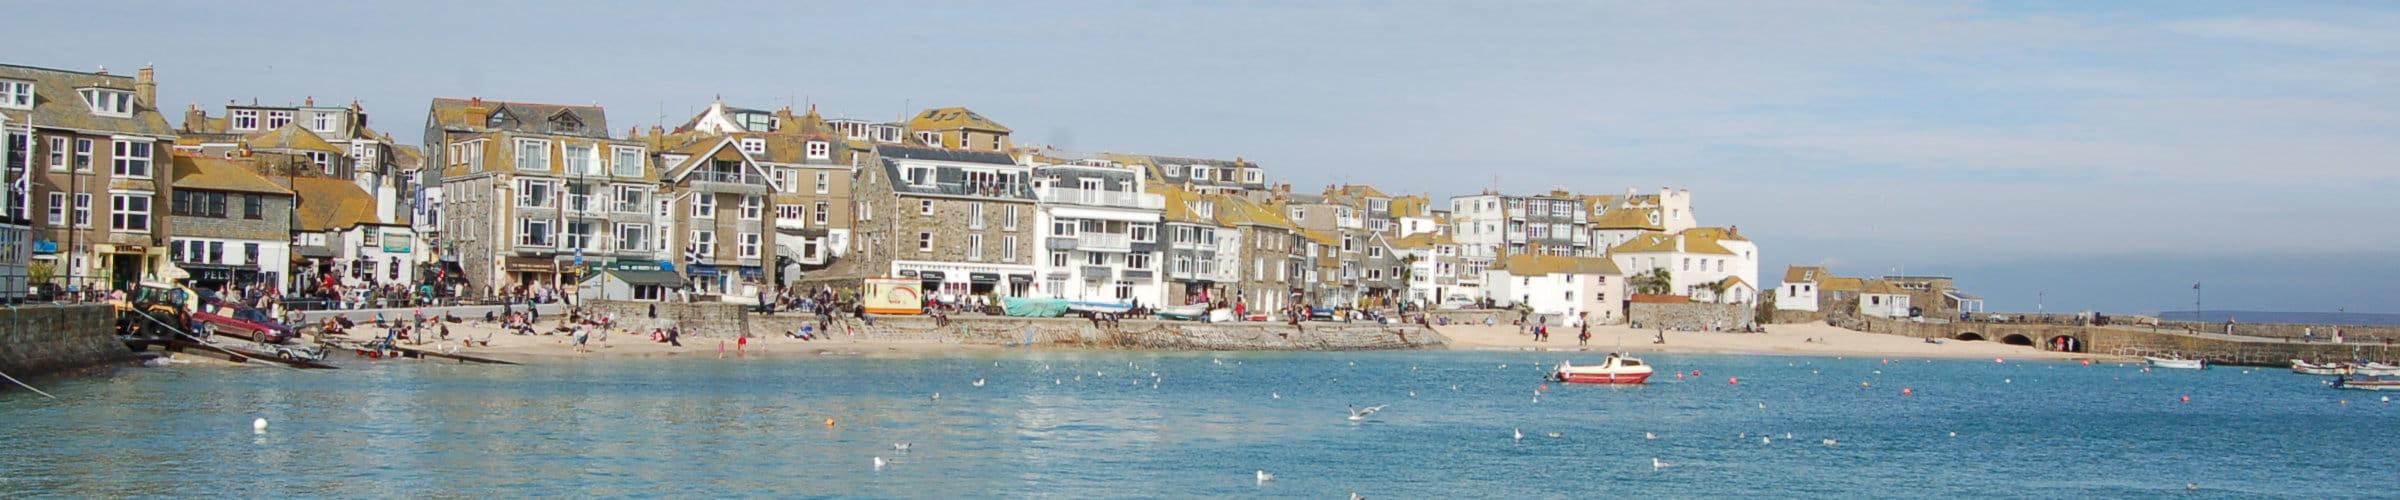 St Ives Harbour-min